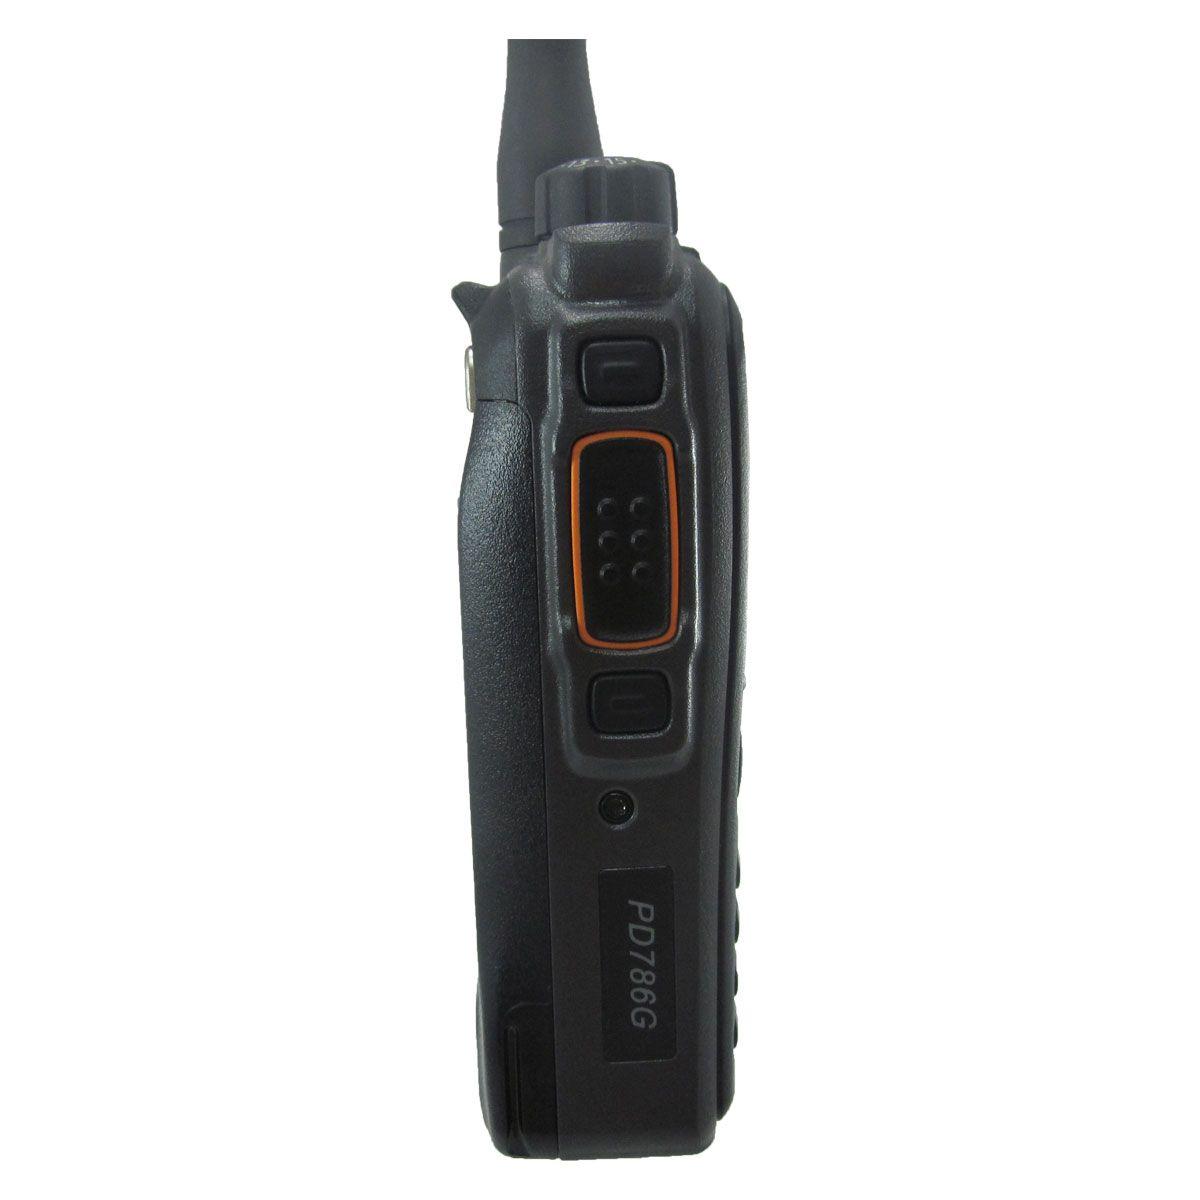 Radio Hytera PD786G Digital PD786G-U2 UHF 450-520 MHz